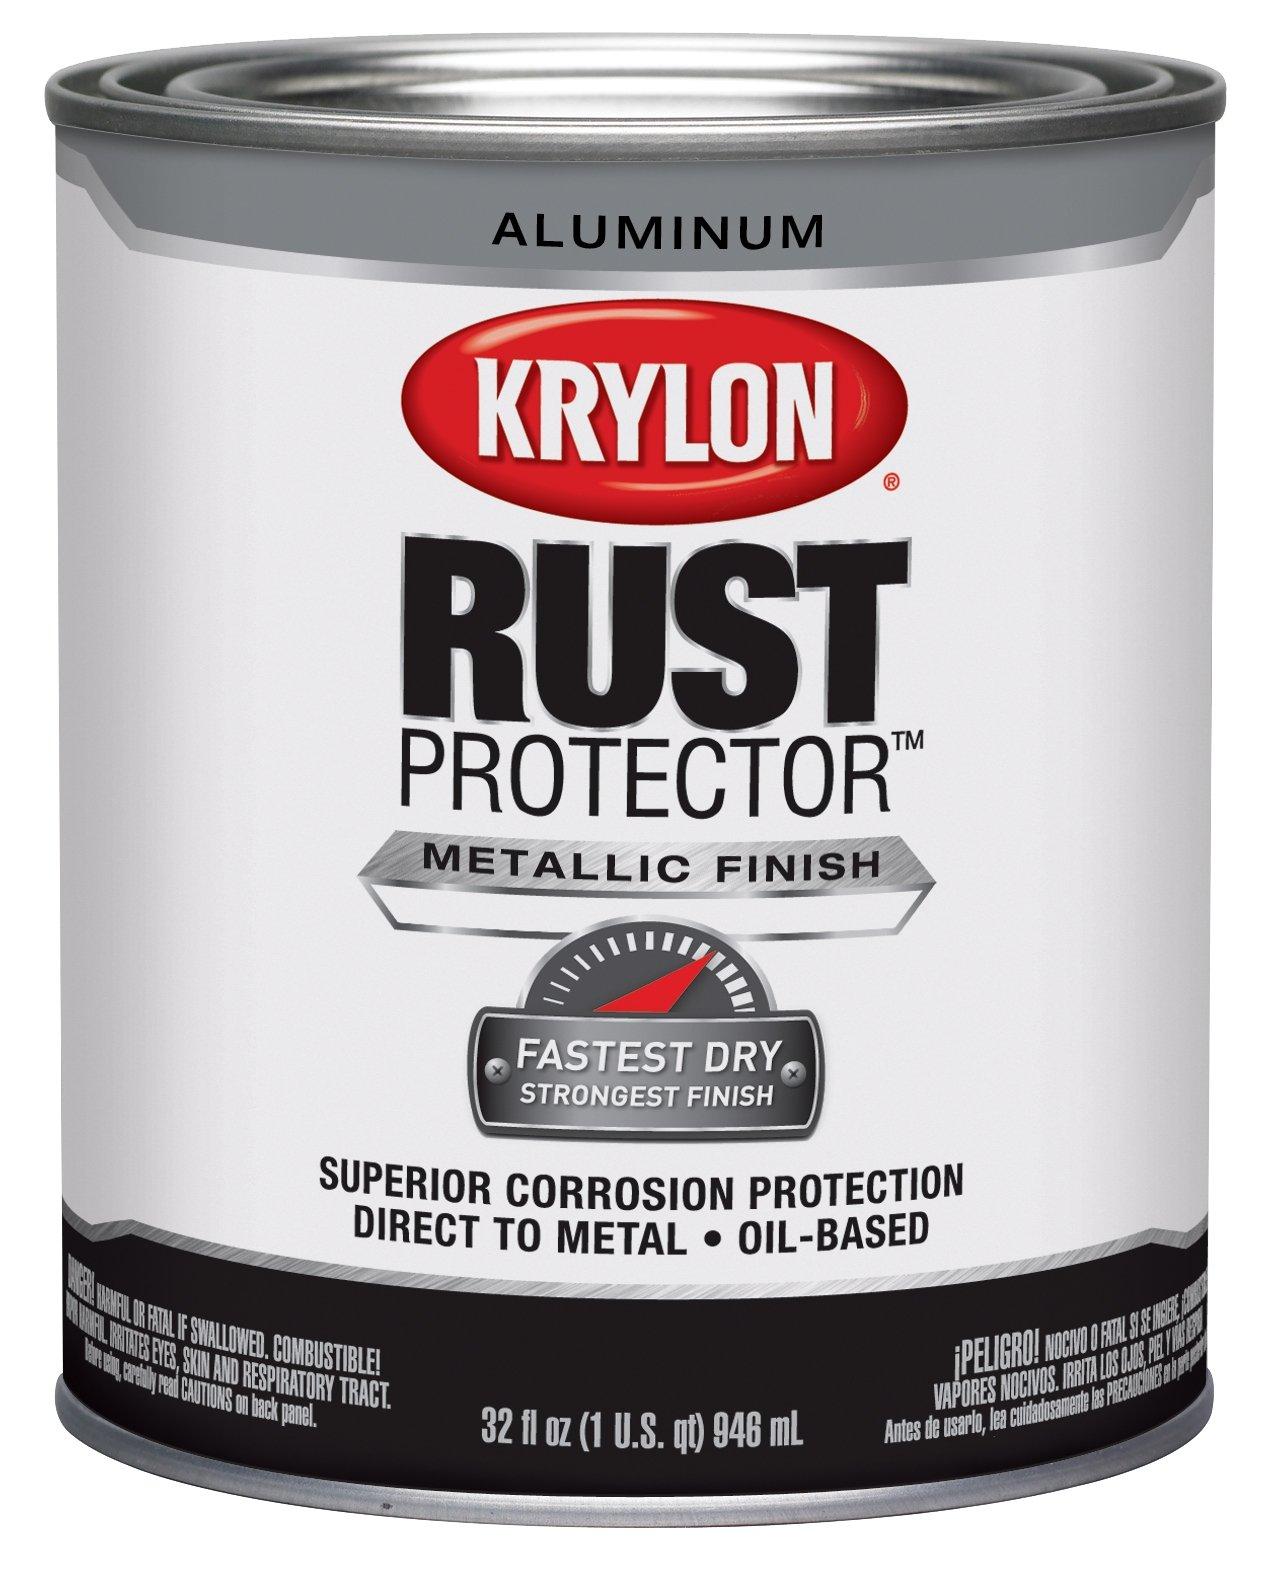 Krylon K06921200 Rust Protector and Preventative Enamel with Primer Quarts, Aluminum